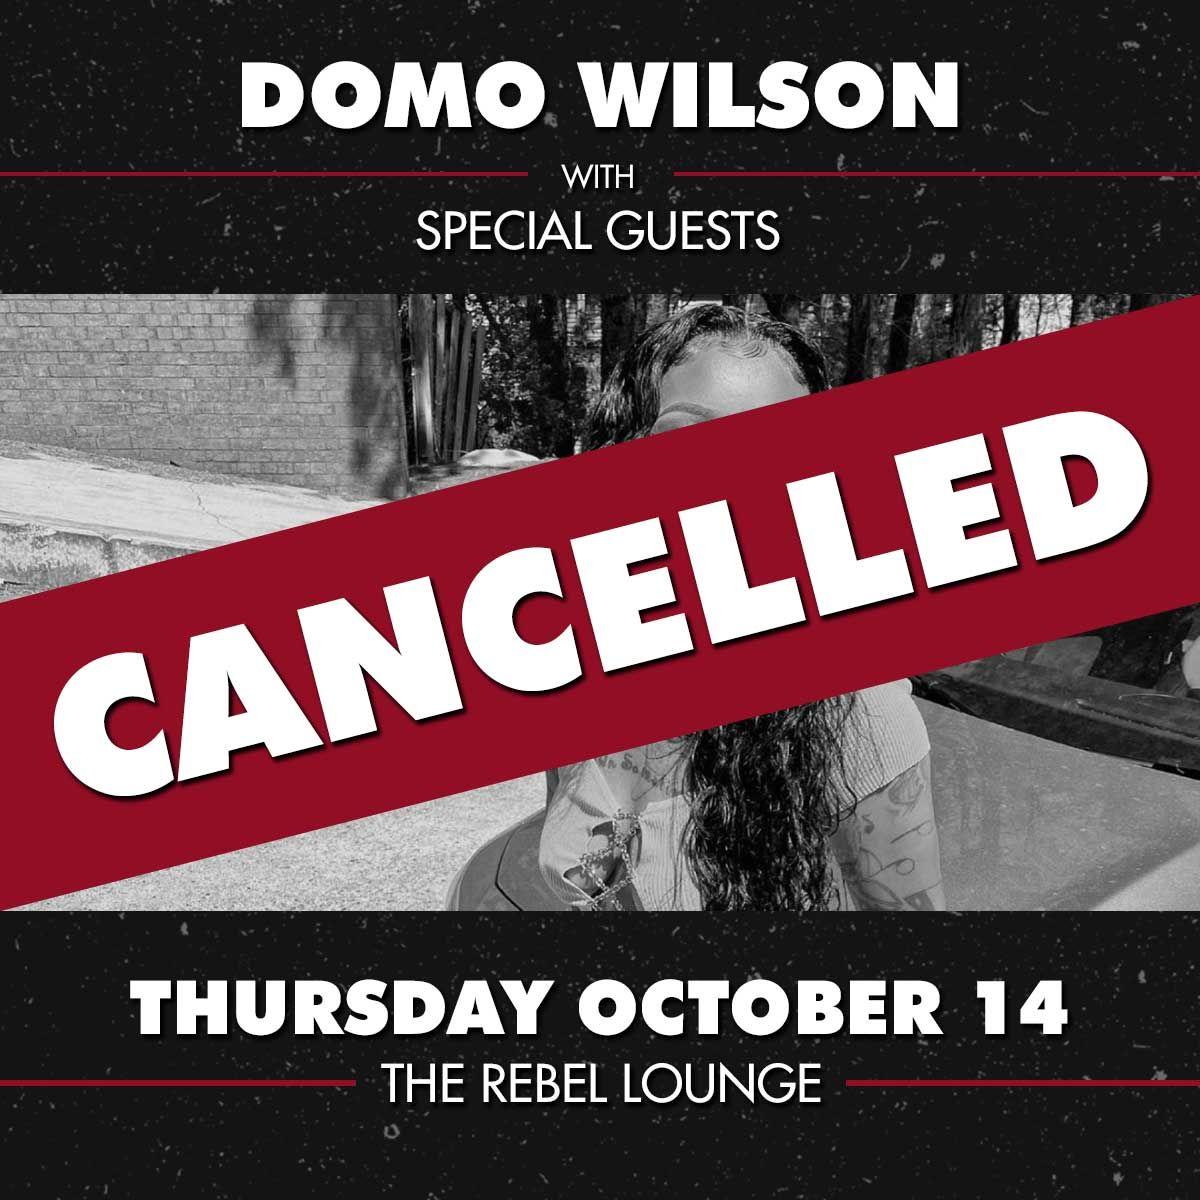 DOMO WILSON : Cancelled: